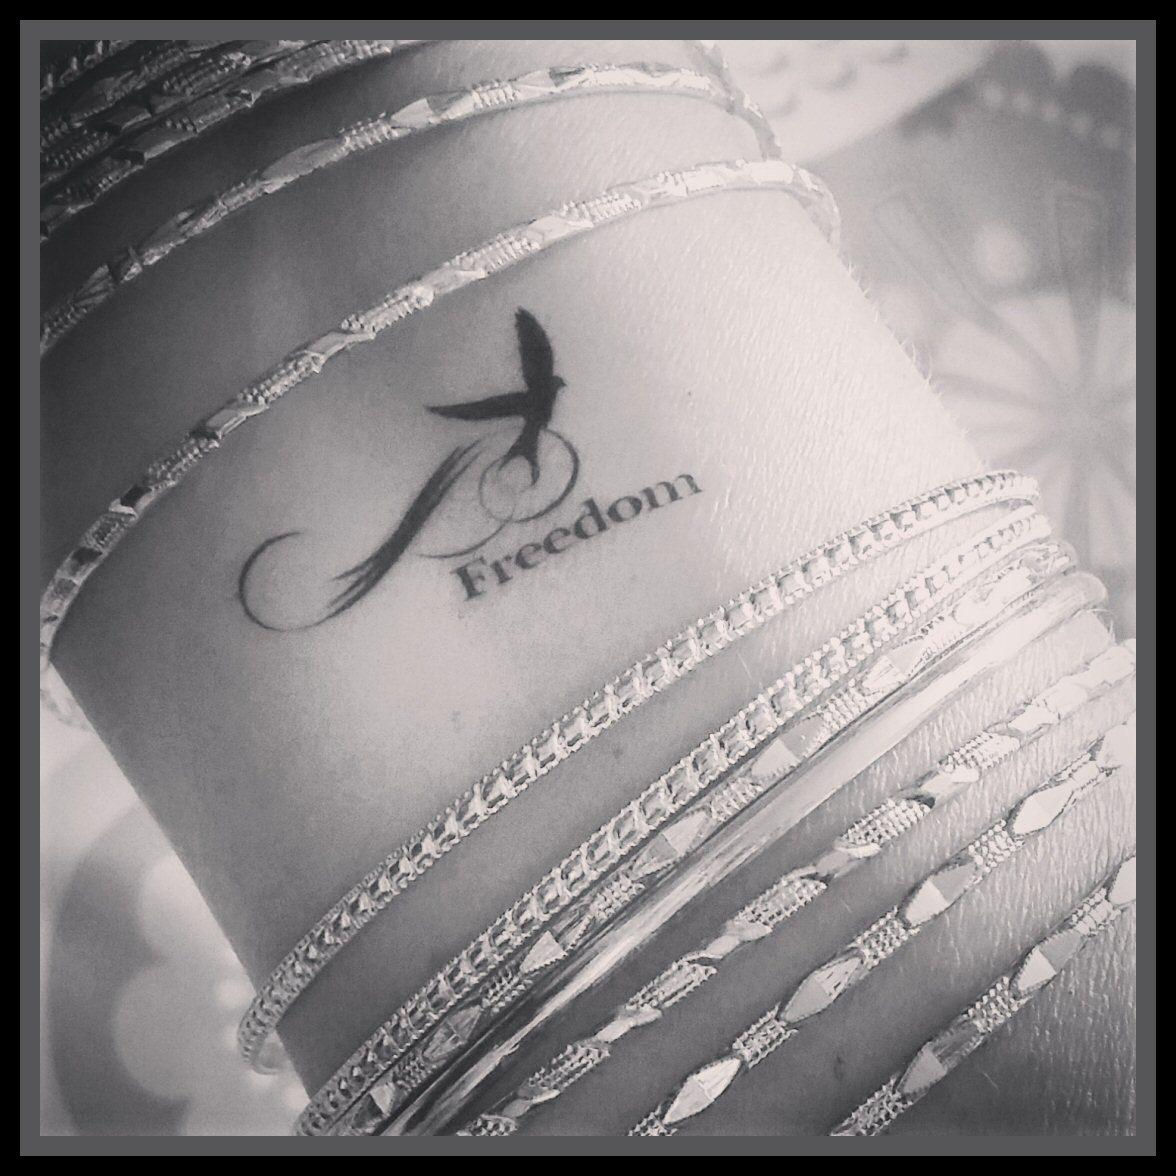 Bird Temporary Tattoo Freedom Tattoo Quote Tattoo Fake